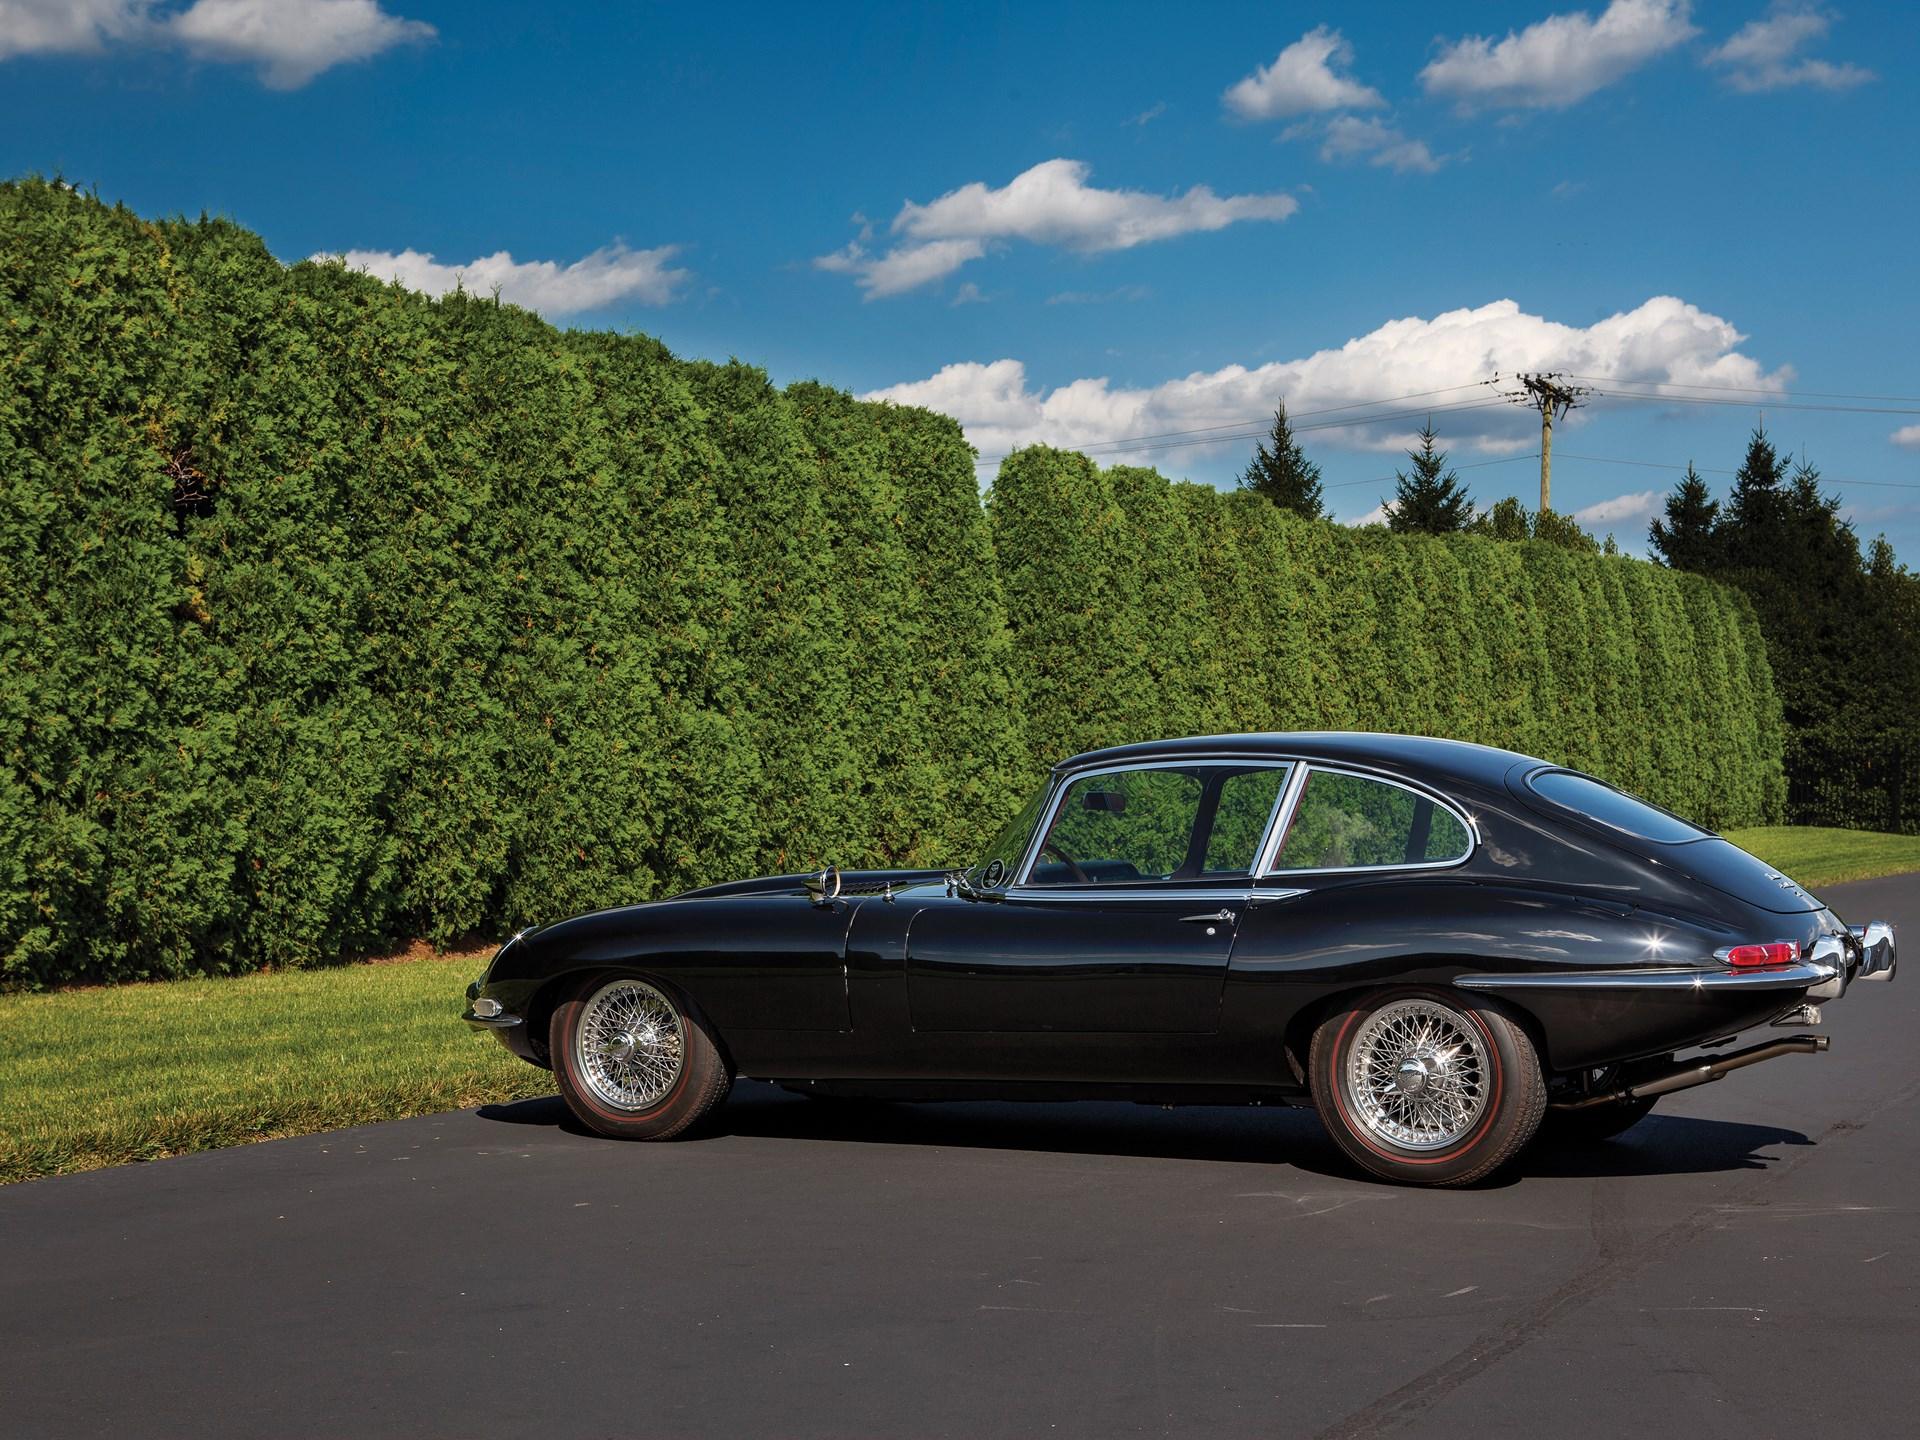 1966 Jaguar E-Type Series 1 4.2-Litre 2+2